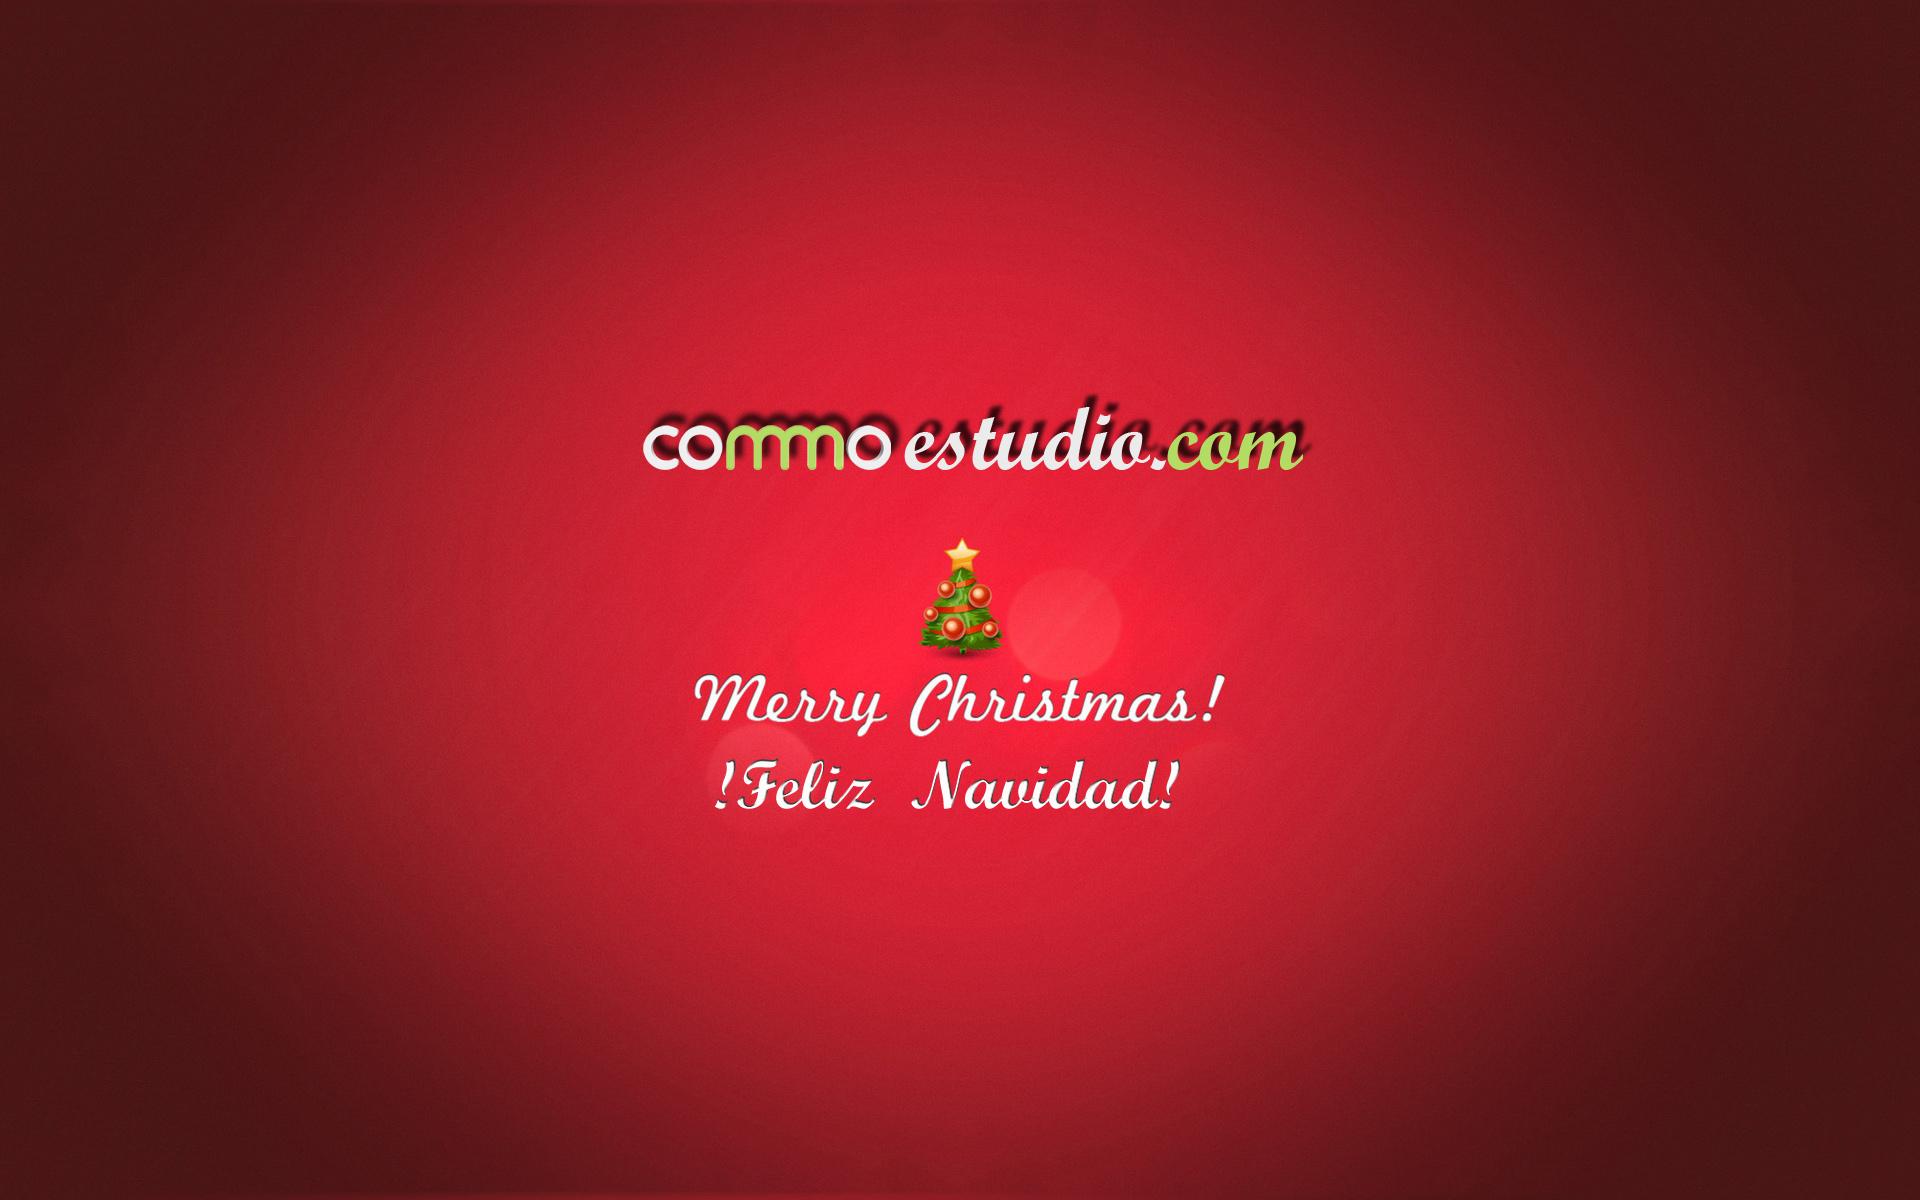 feliz navidad commo